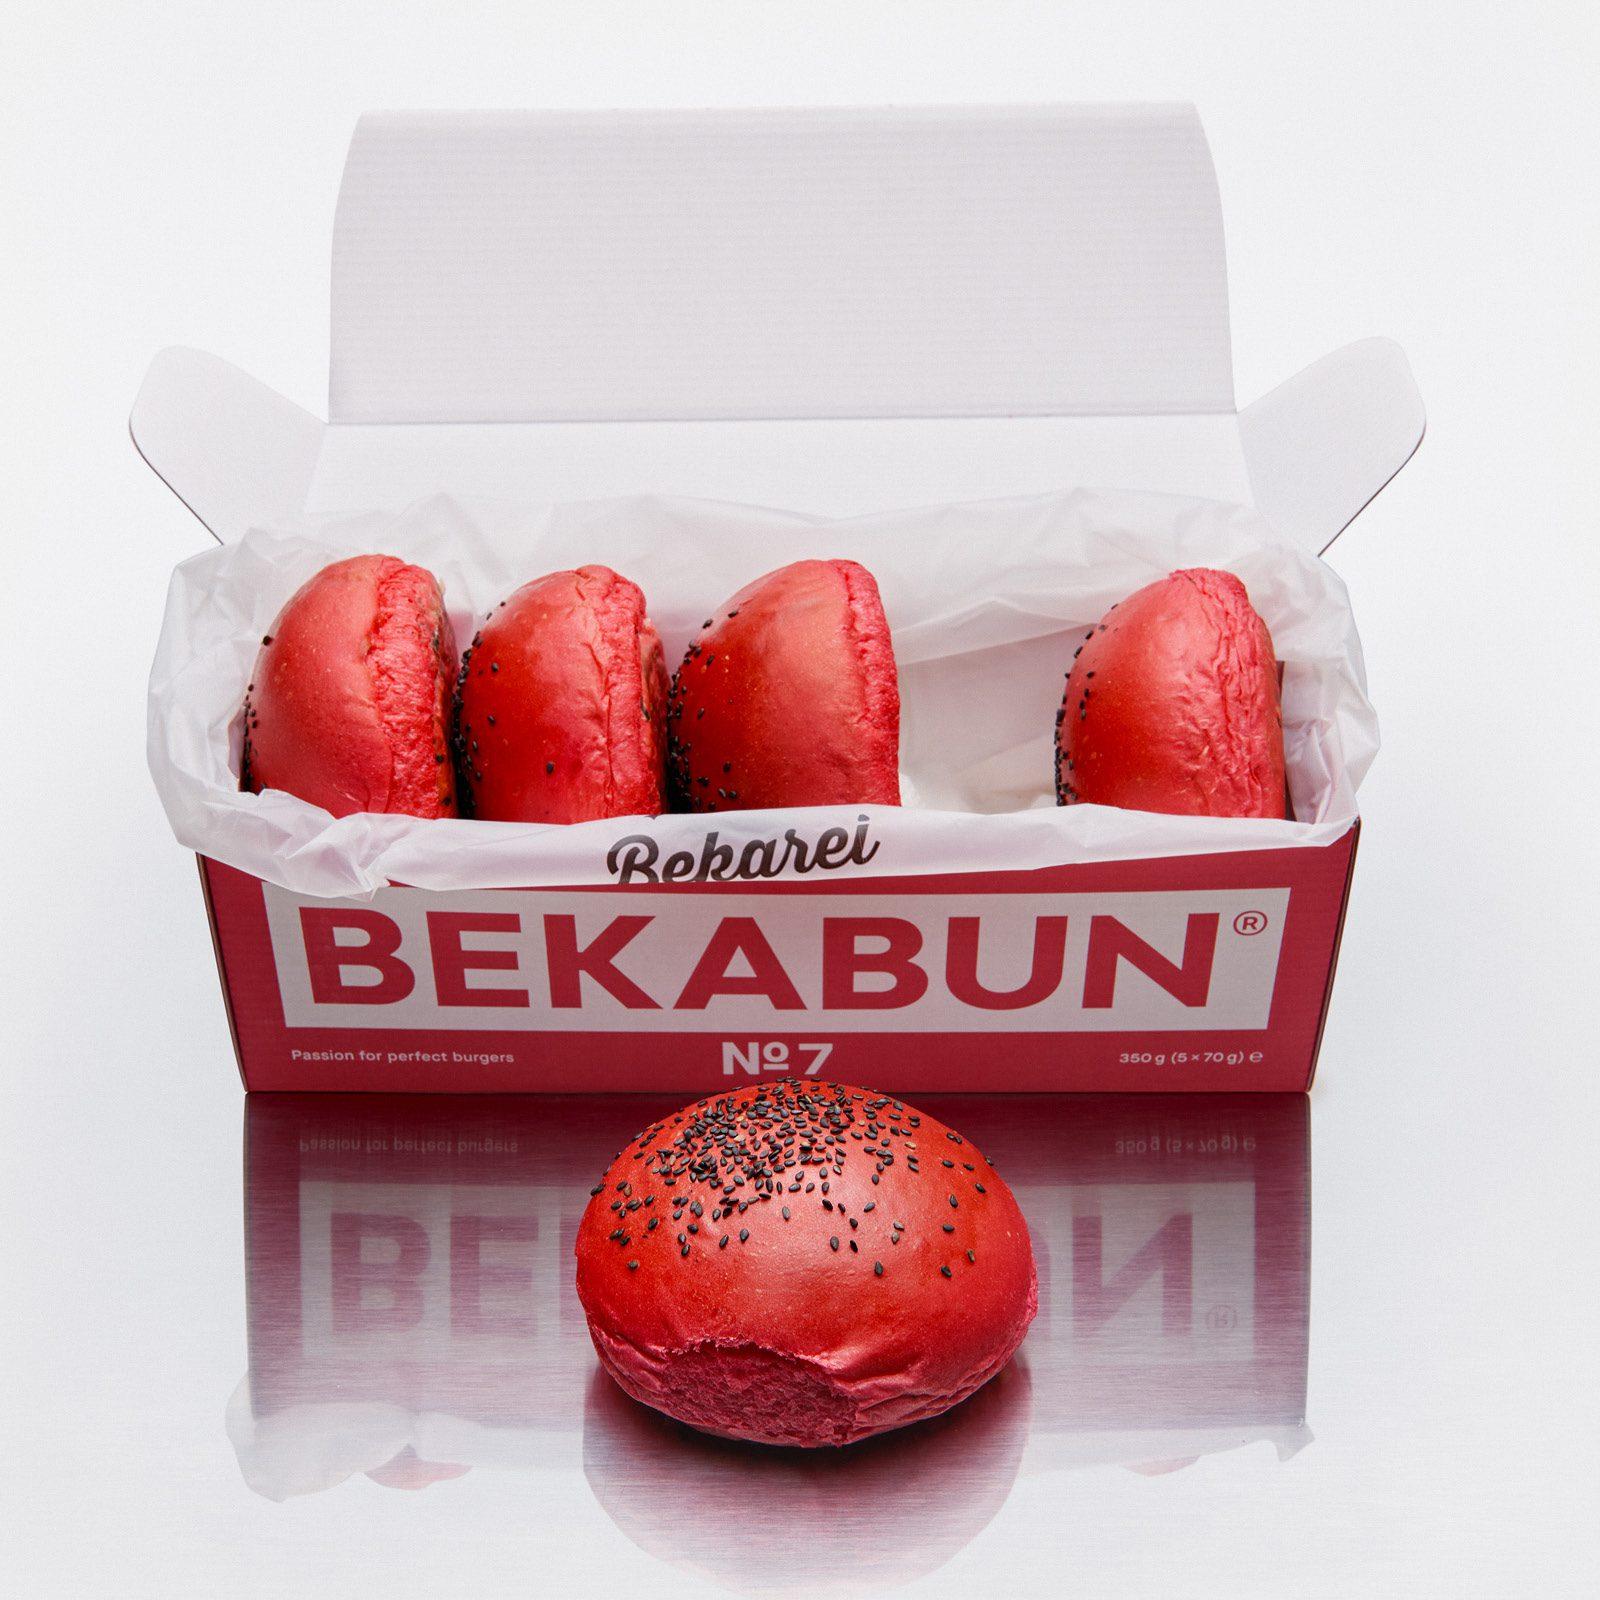 Bekarei BEKABUN No7 Box Referenz der Agentur RIGHT Marketing Berlin.